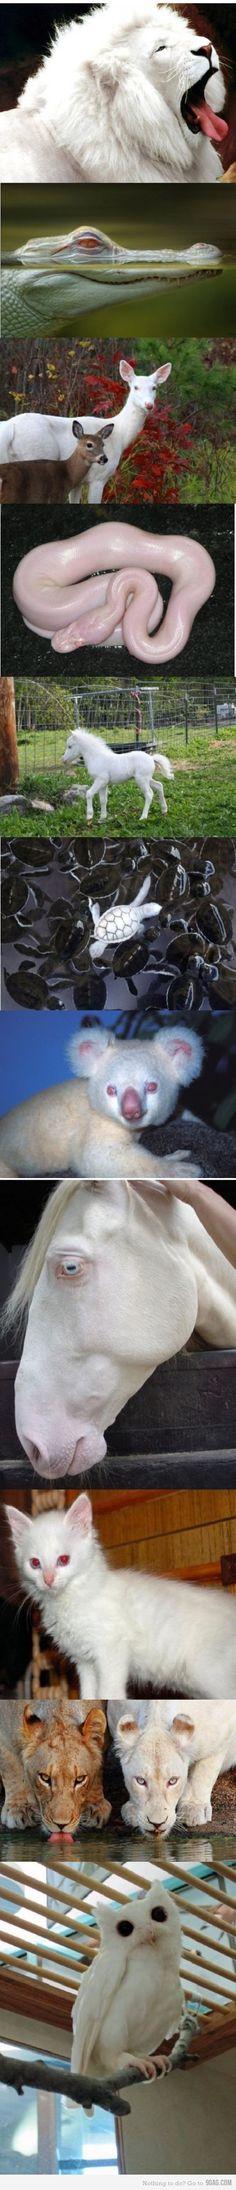 Just some albino animals